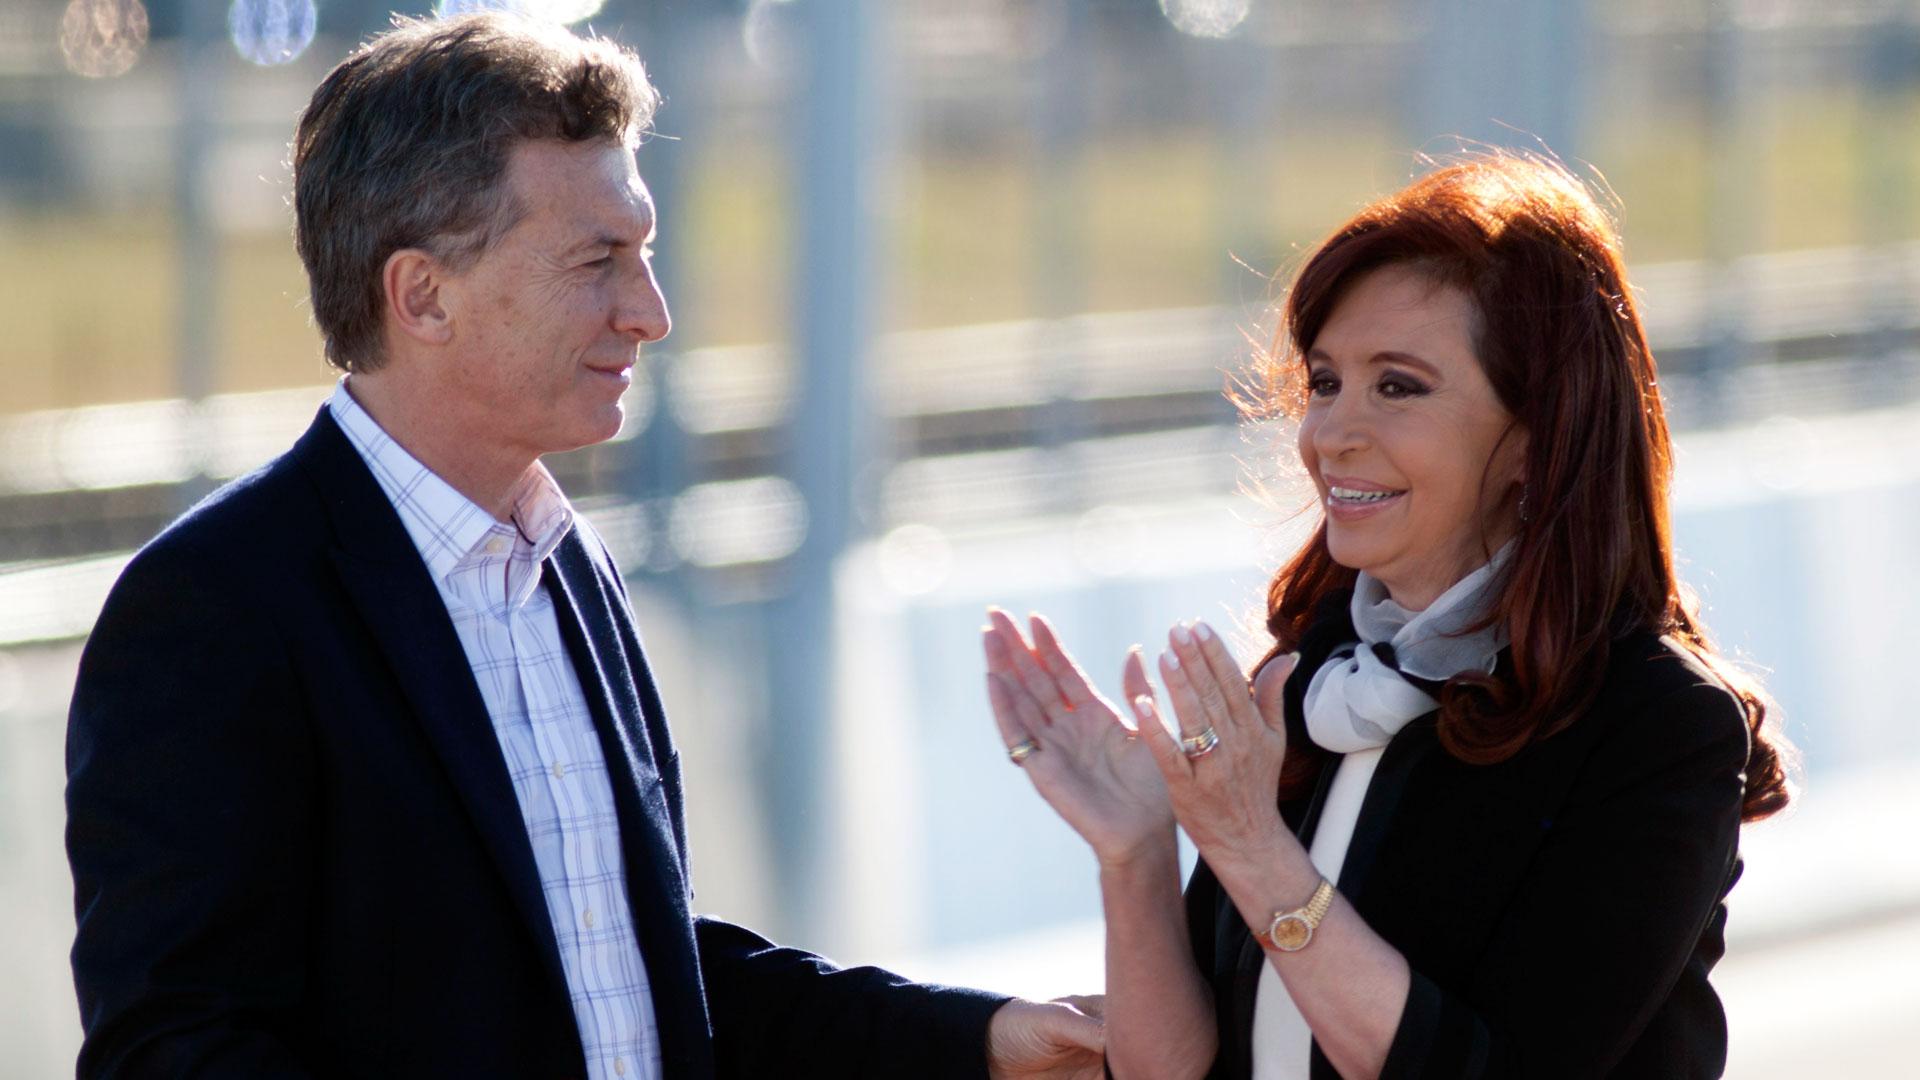 Déficit e inflación marcaron el rumbo económico de Macri y su antecesora, Cristina Kirchner. (NA)